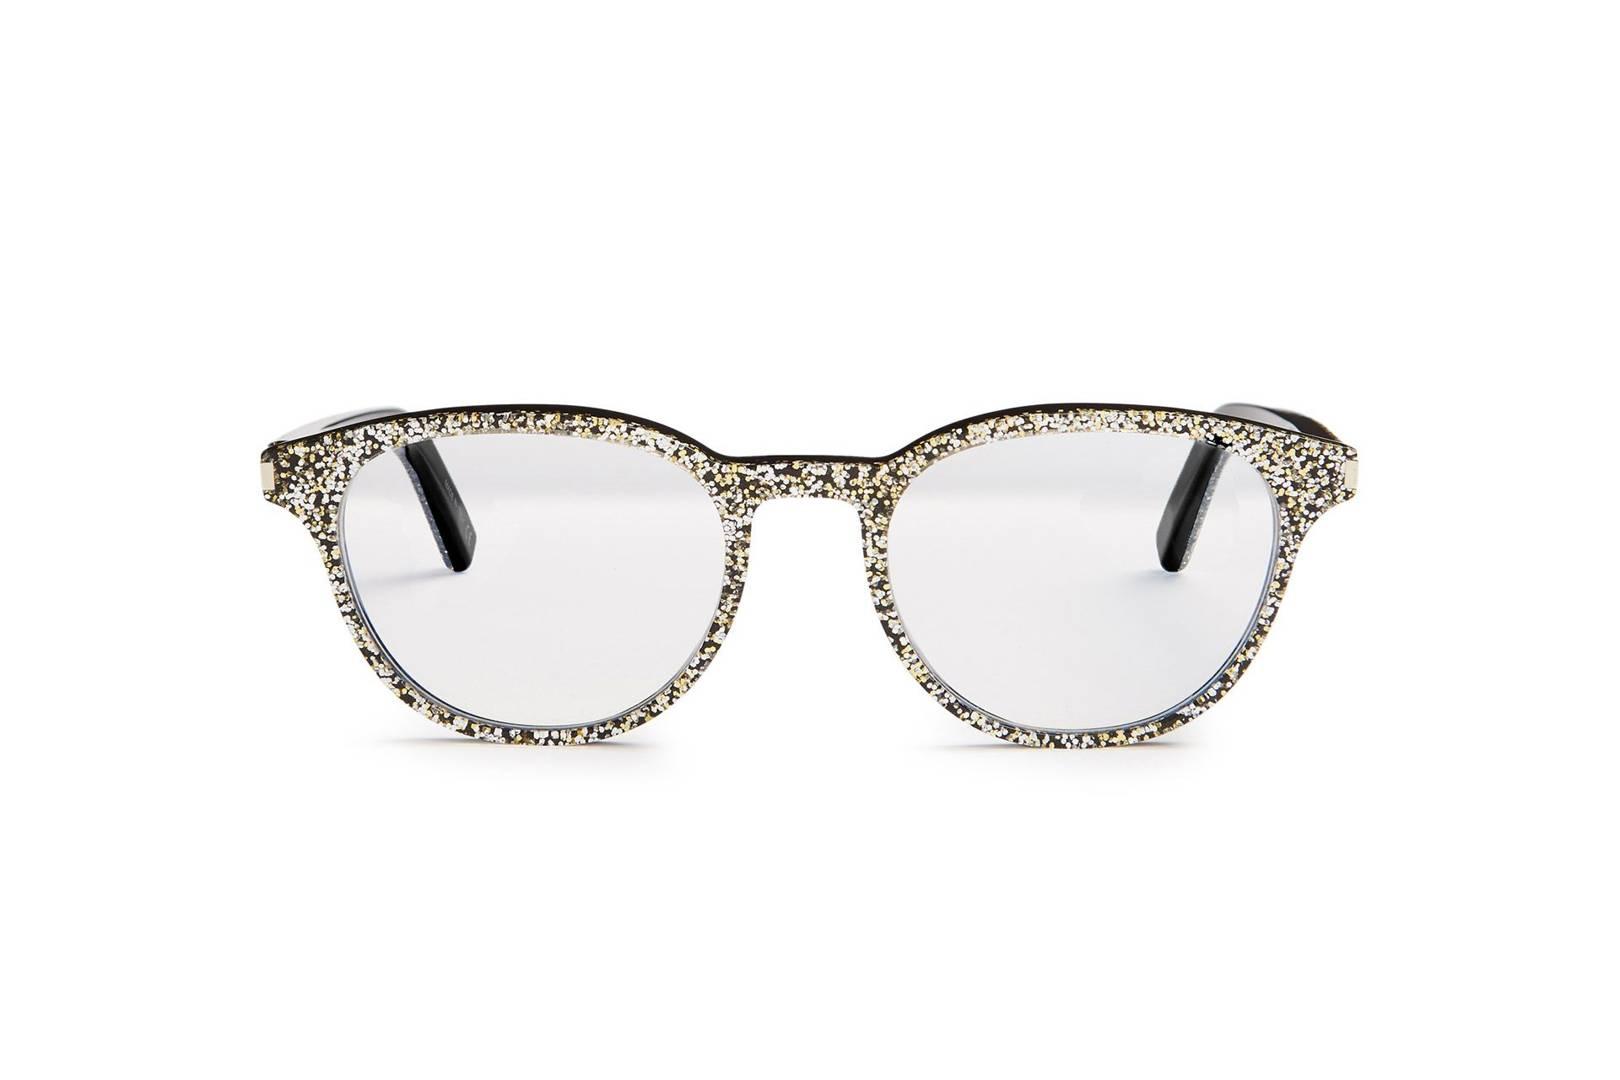 6c9a7a00d0 Best Designer Glasses 2017  Stylish Glasses To Shop Now